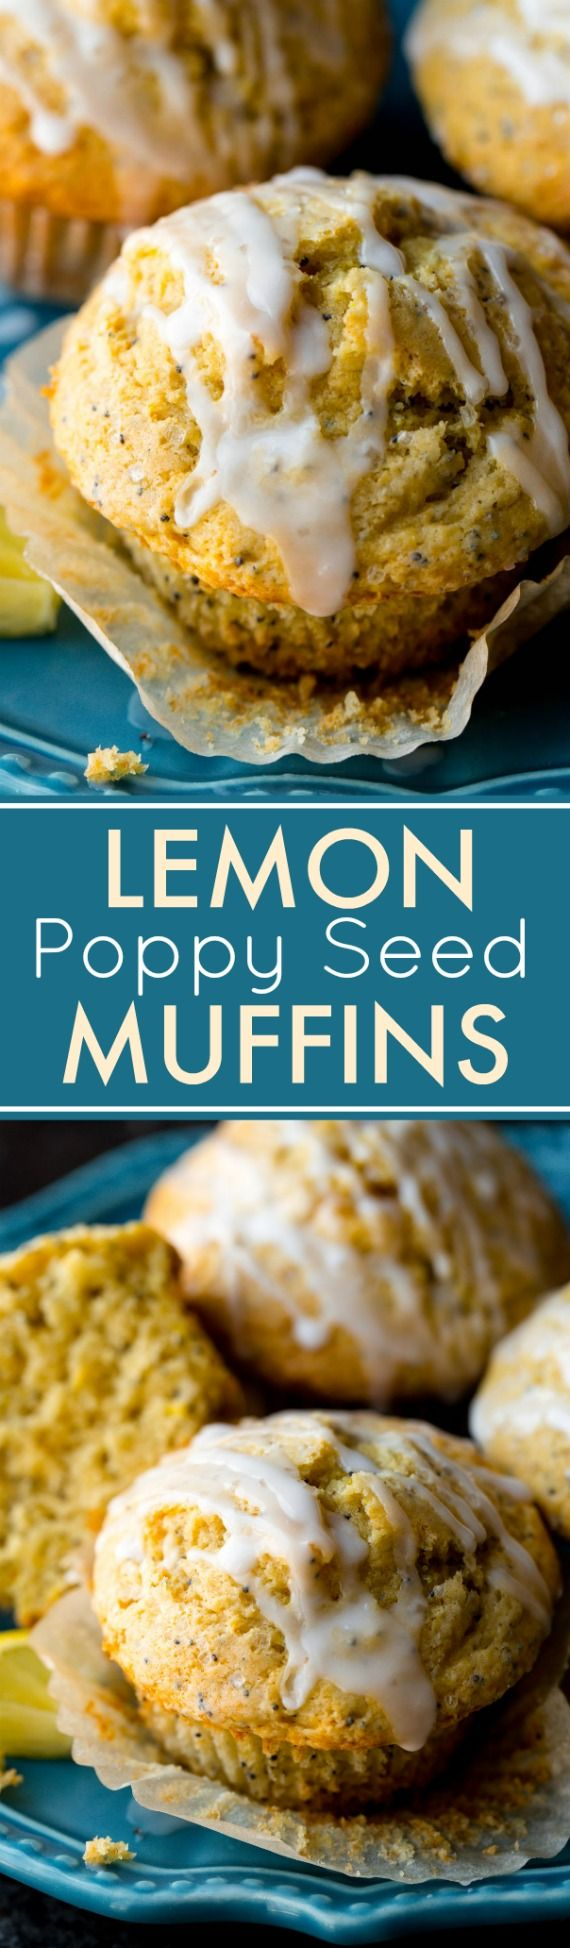 These are my favorite lemon poppy seed muffins! Soft, fluffy, recipe on sallysbakingaddiction.com